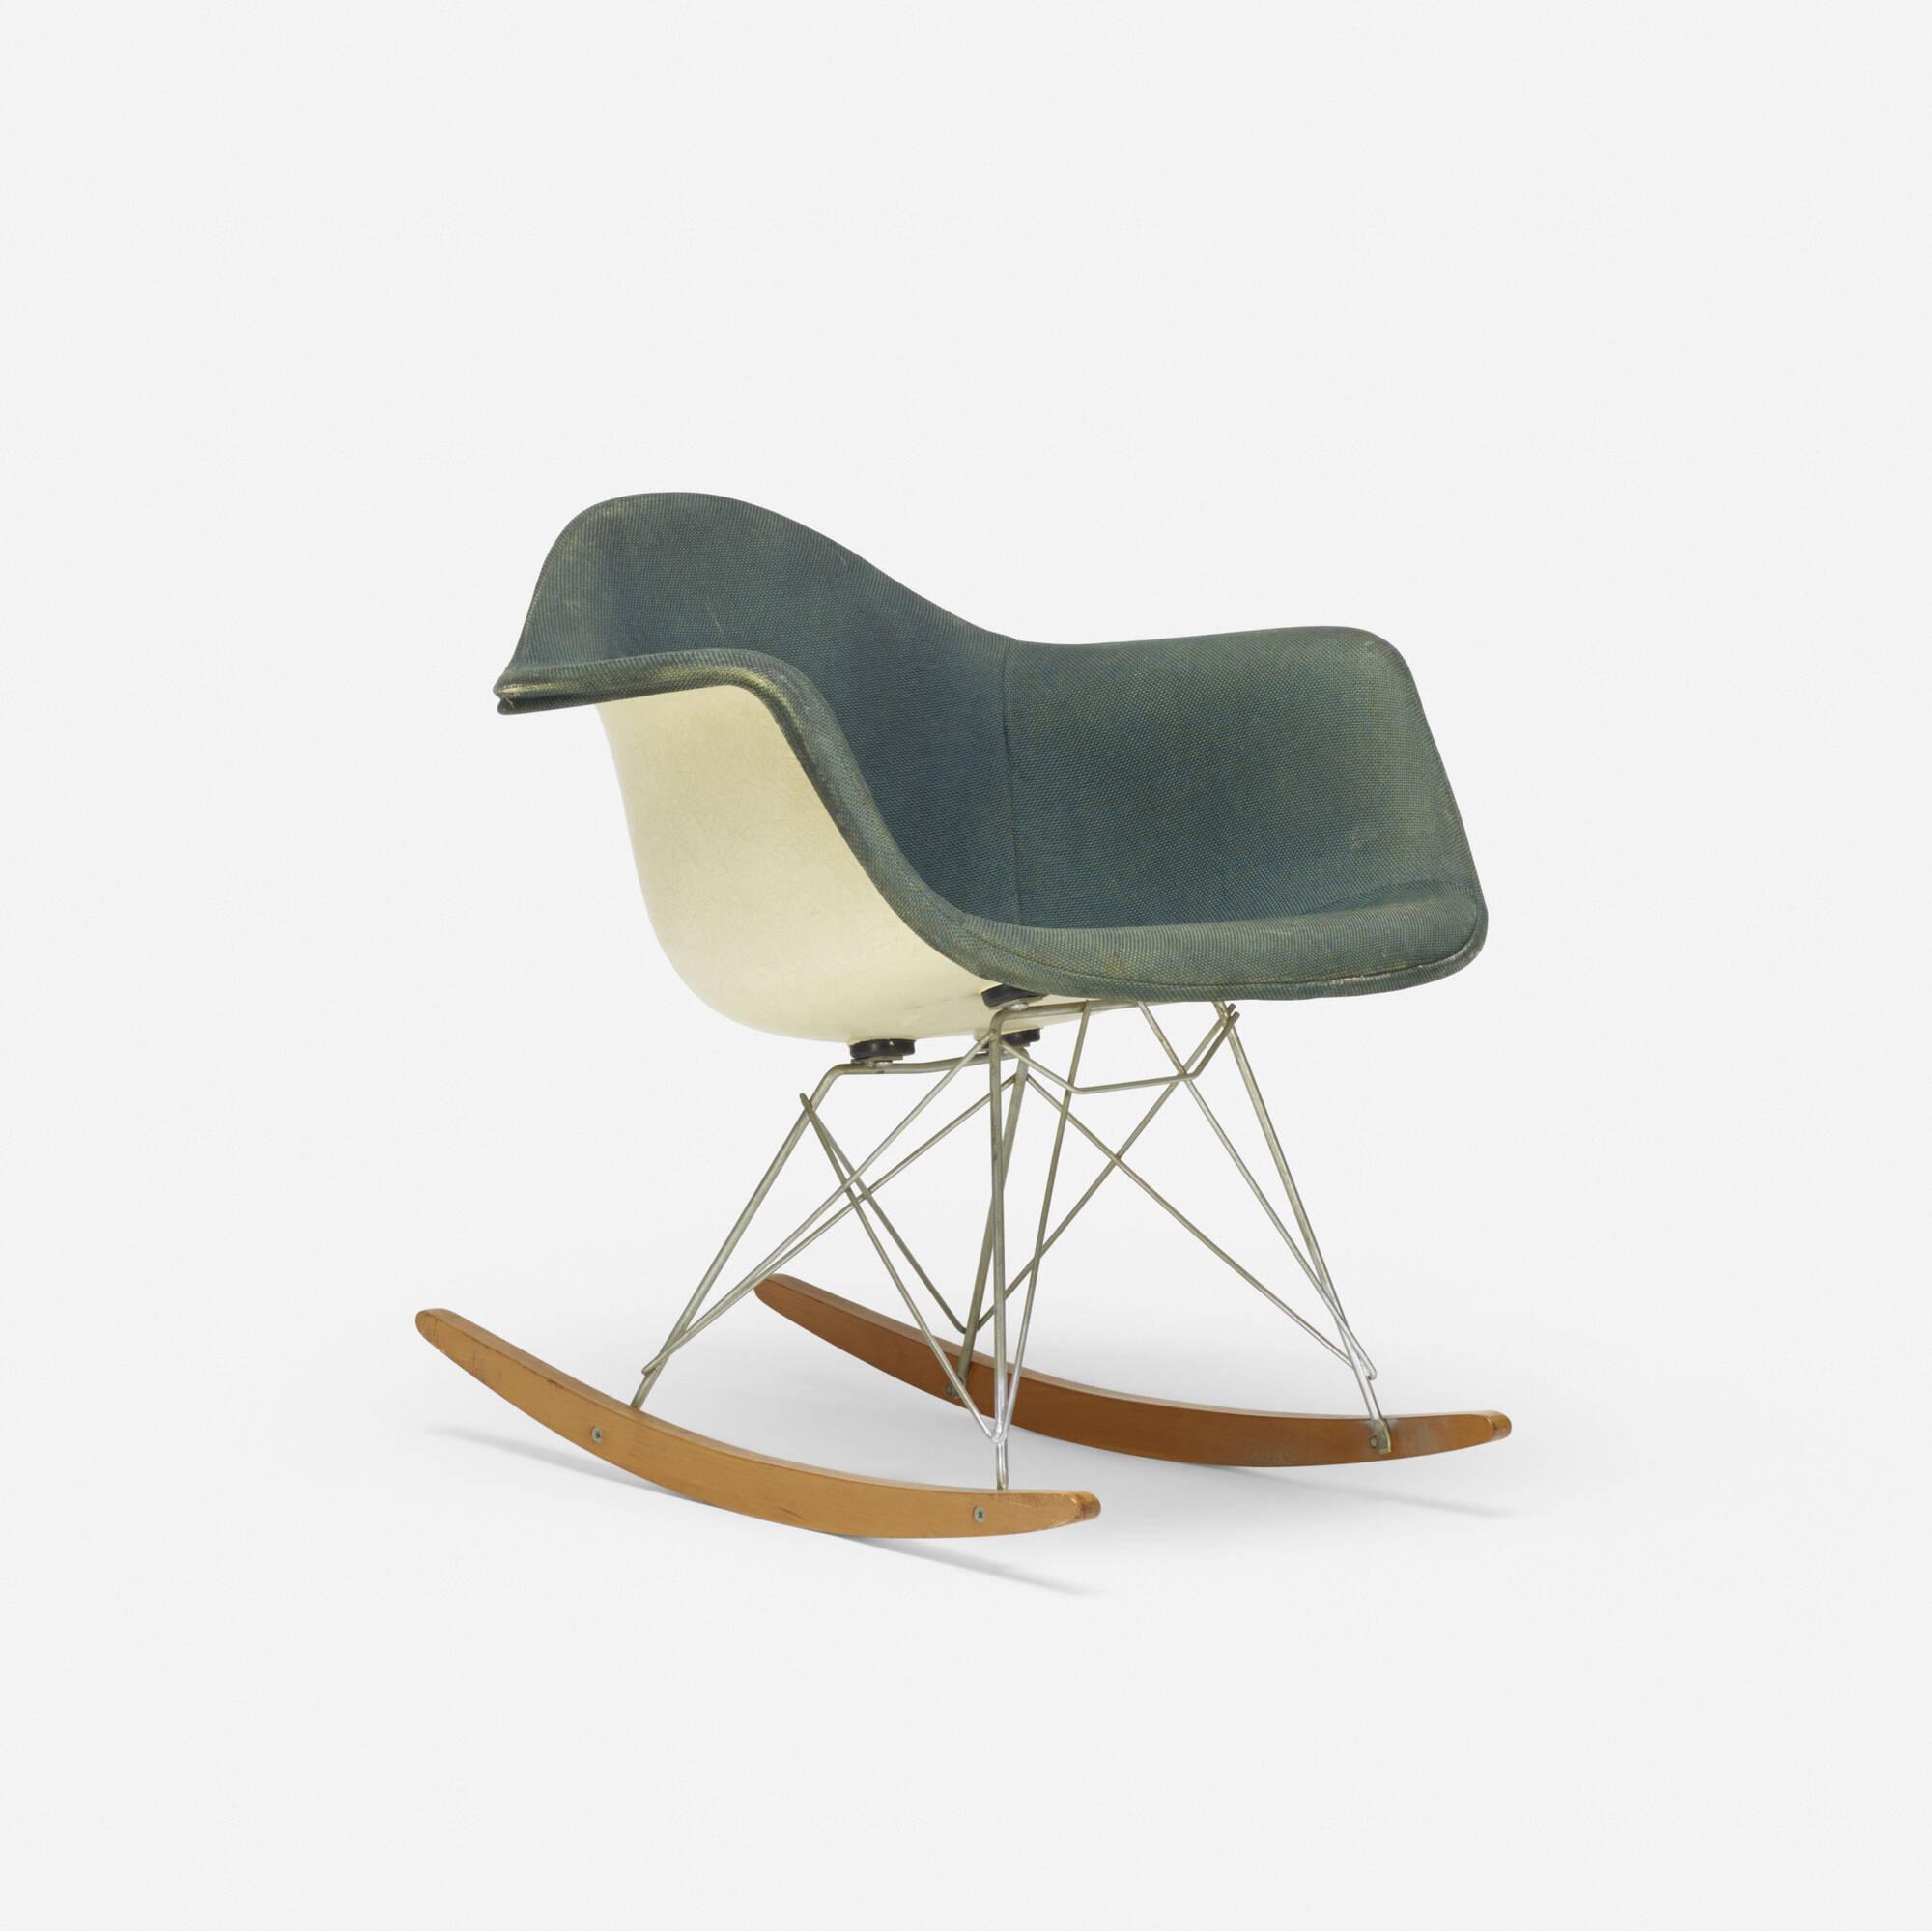 272: Charles and Ray Eames / RAR-1 (1 of 3)